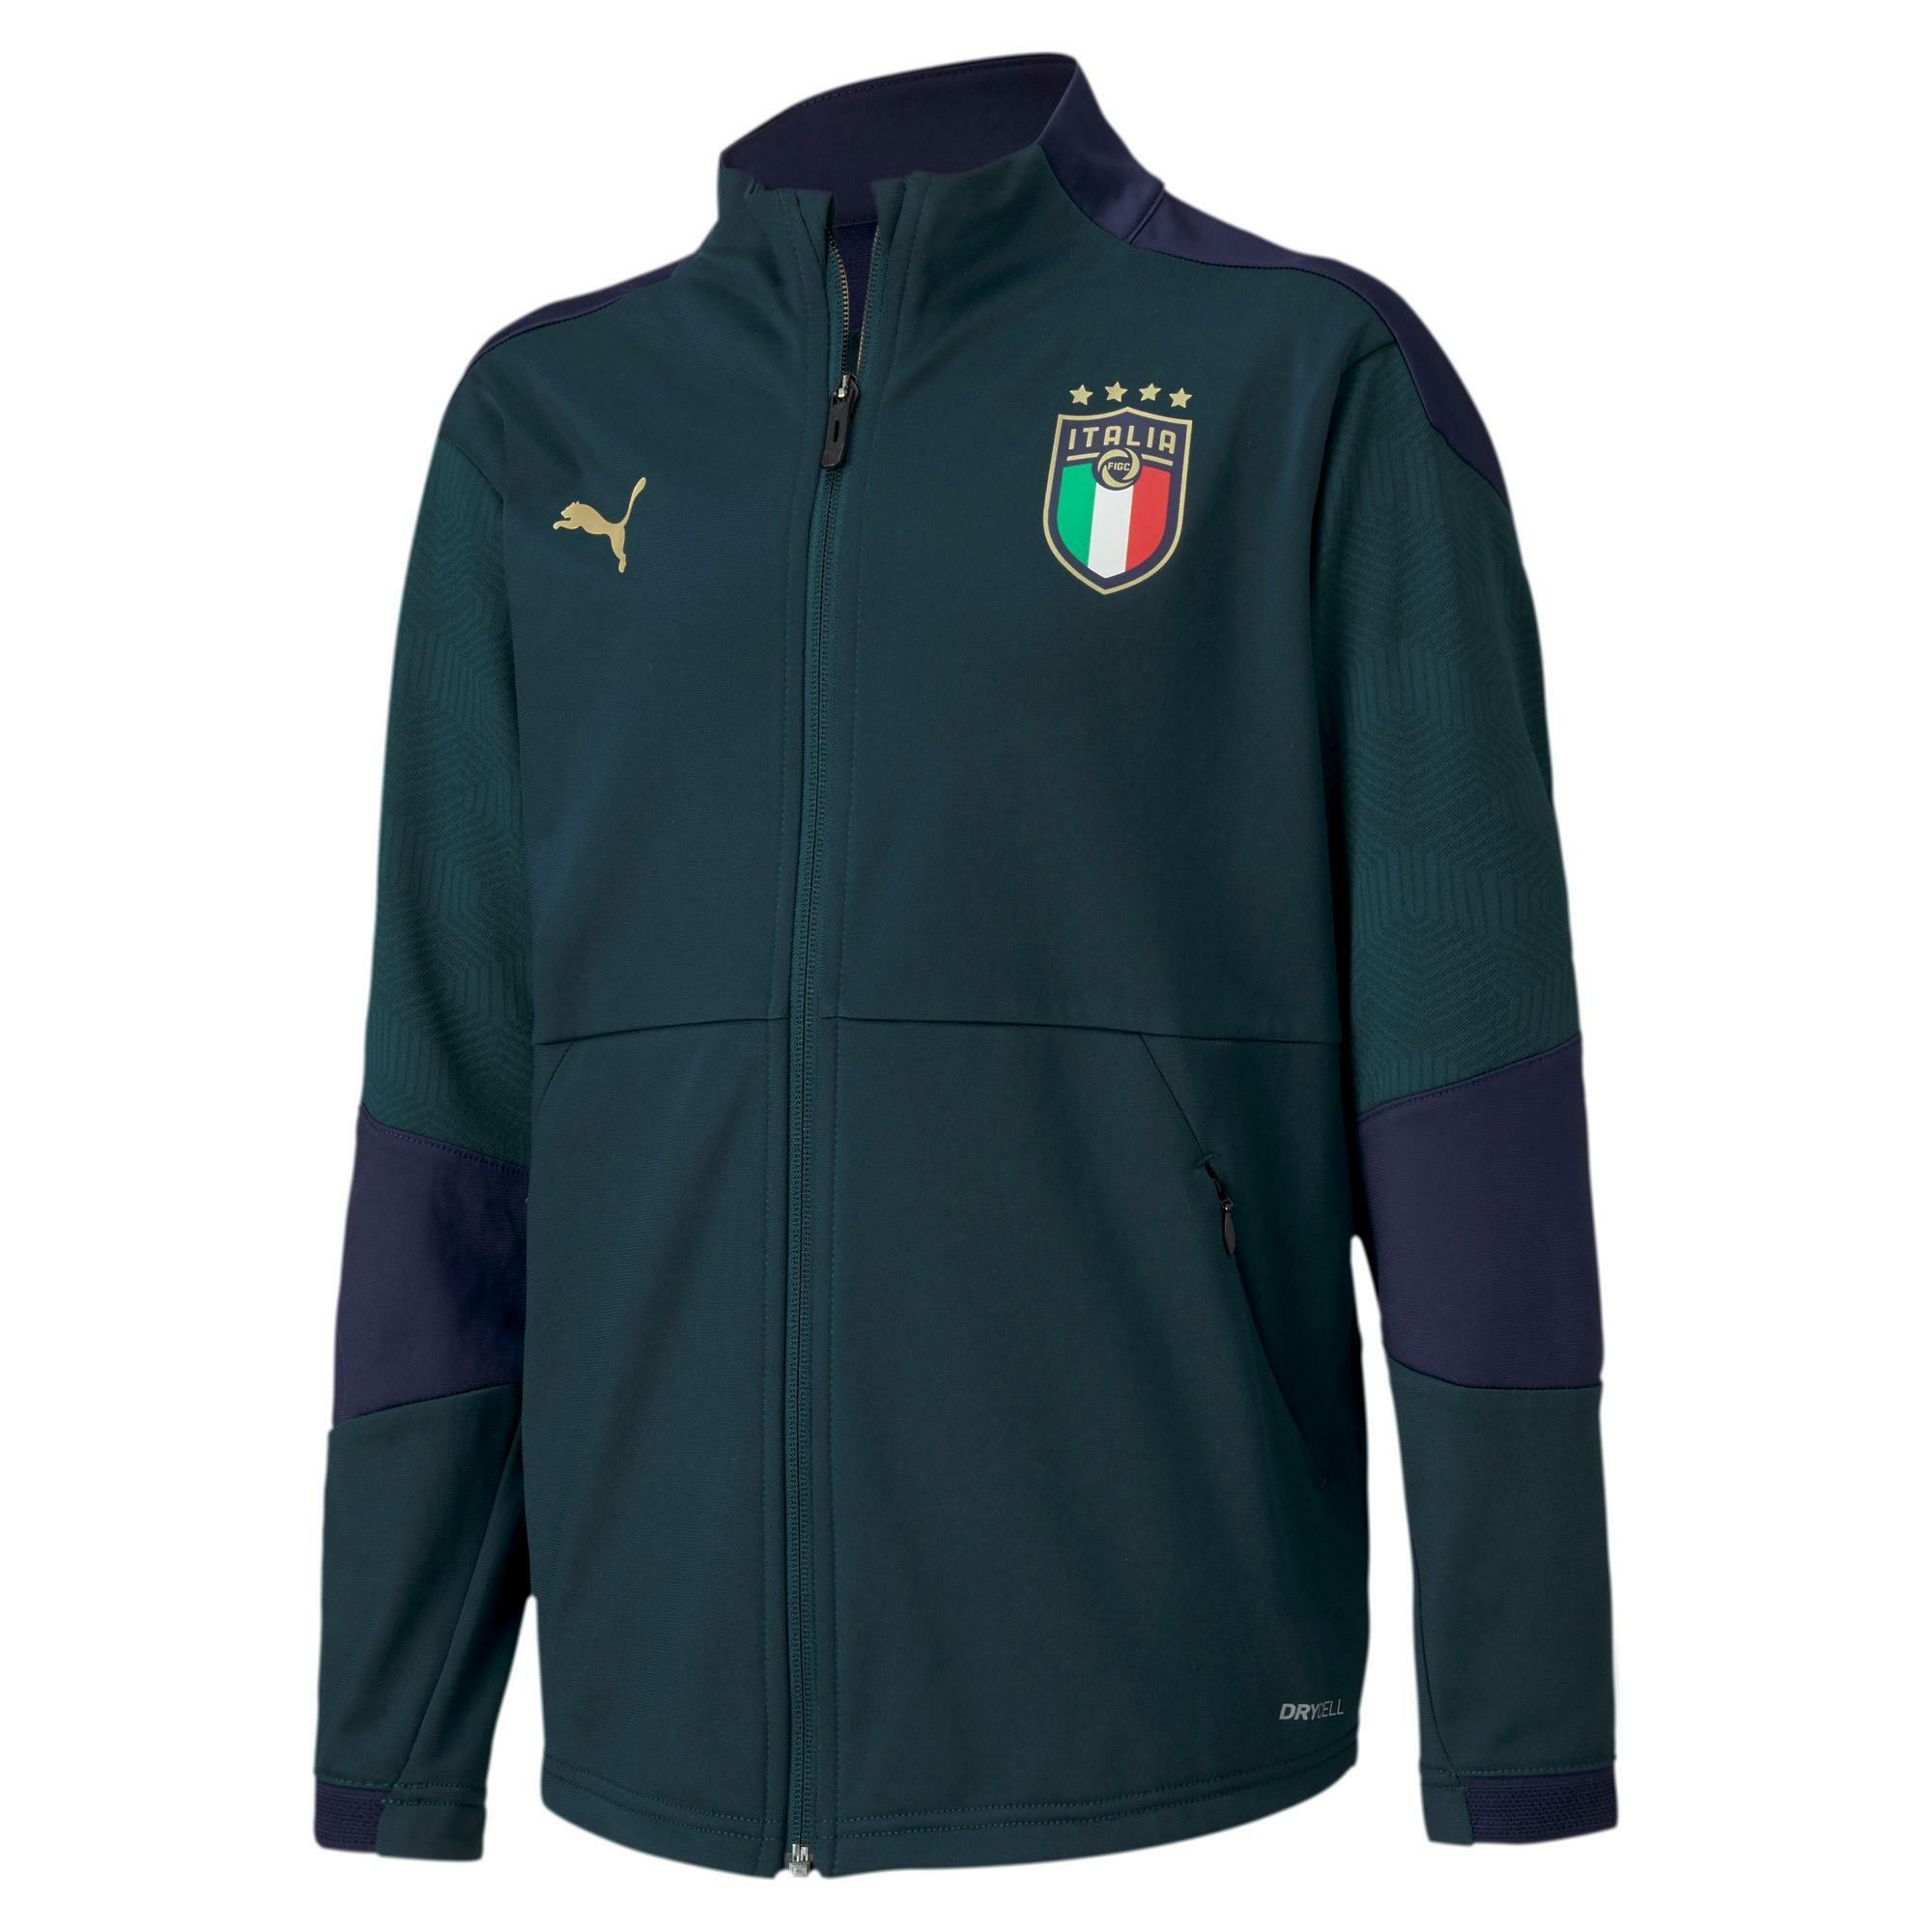 puma puma italia nazionale figc giacca bambino 1920